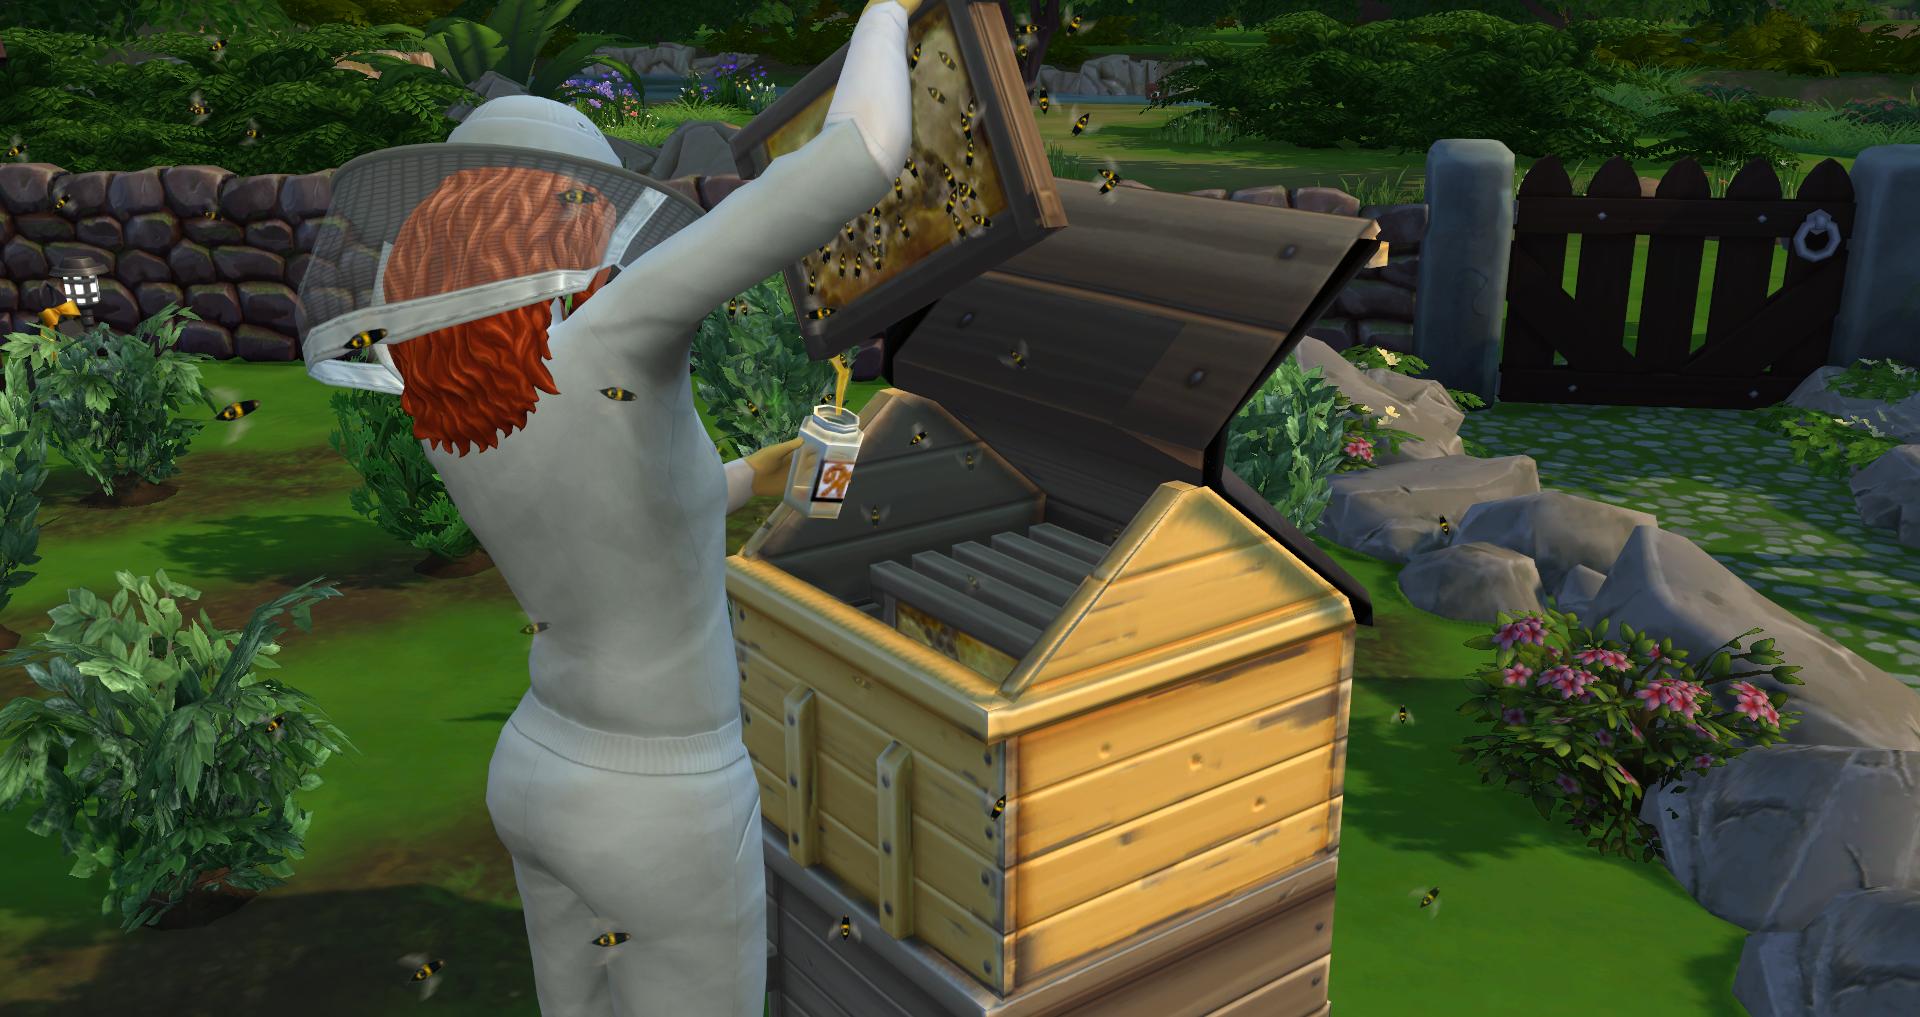 The Sims 4 Seasons: Bees & Beekeeping | SimsVIP